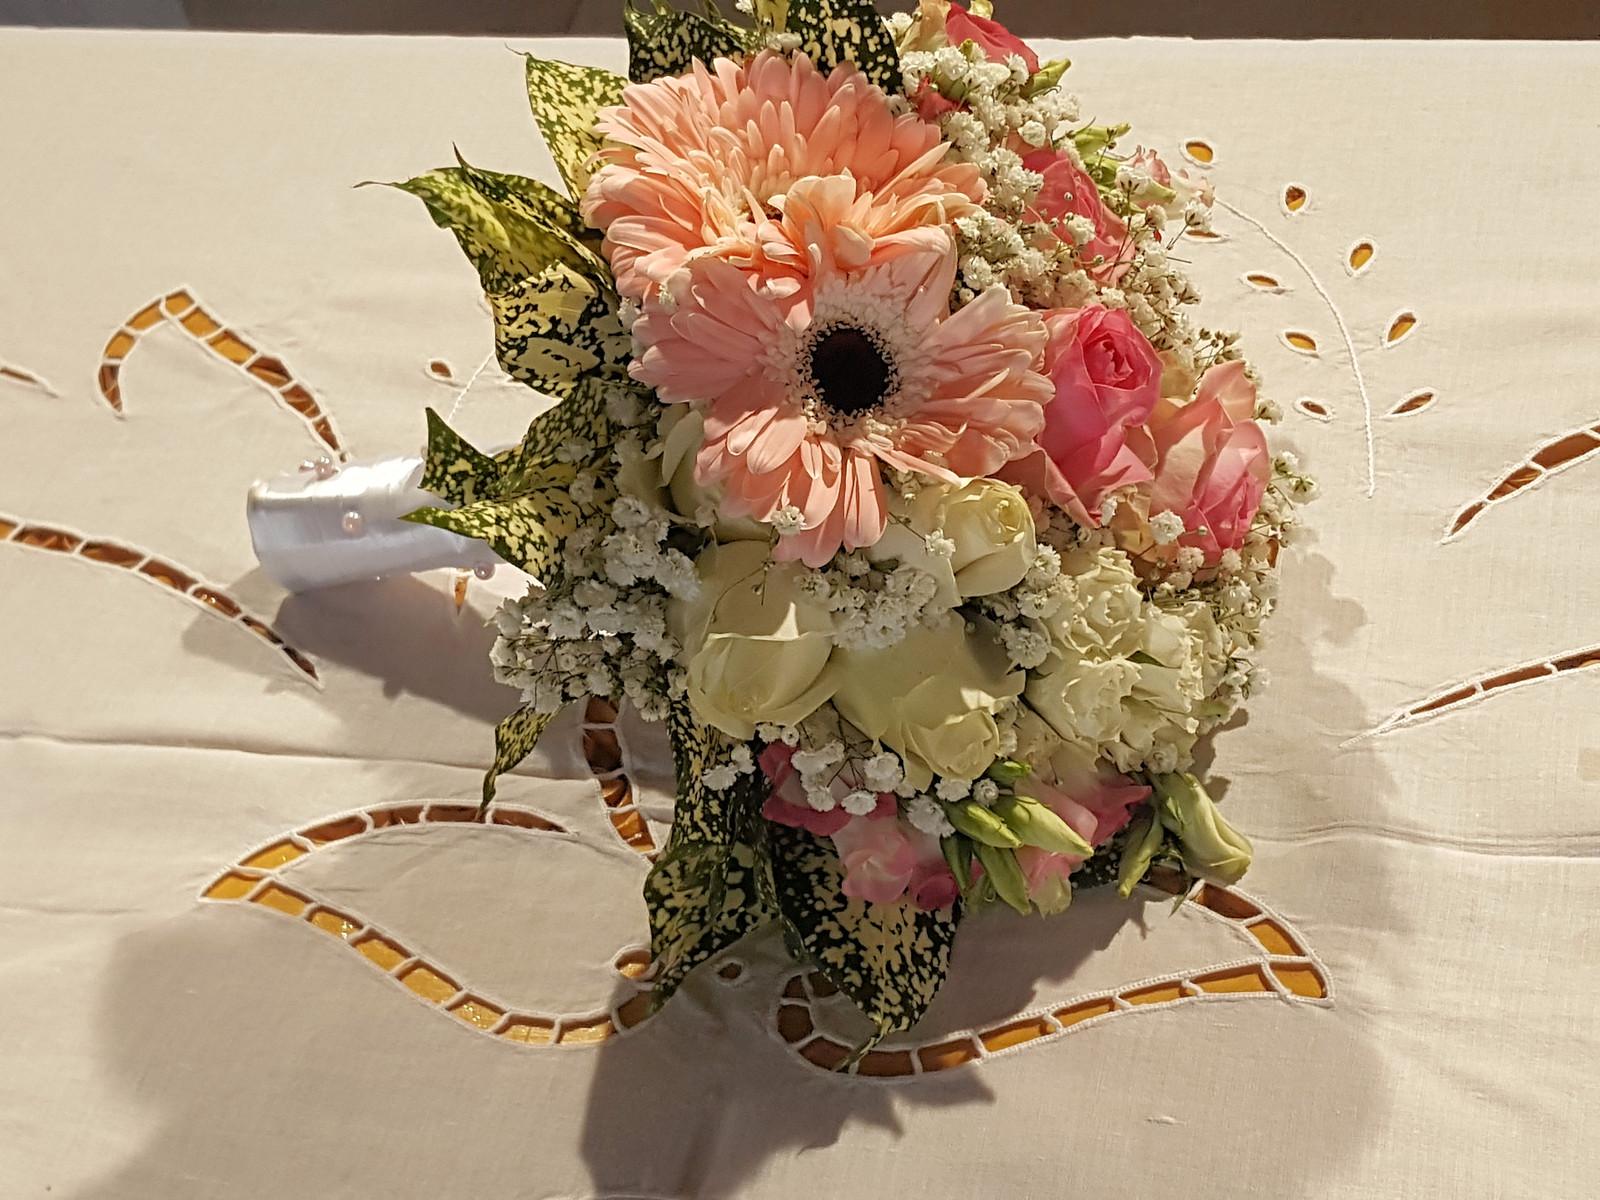 8a4f9bf363d7 Νυφική ανθοδέσμη γάμου σε παλ χρωματα